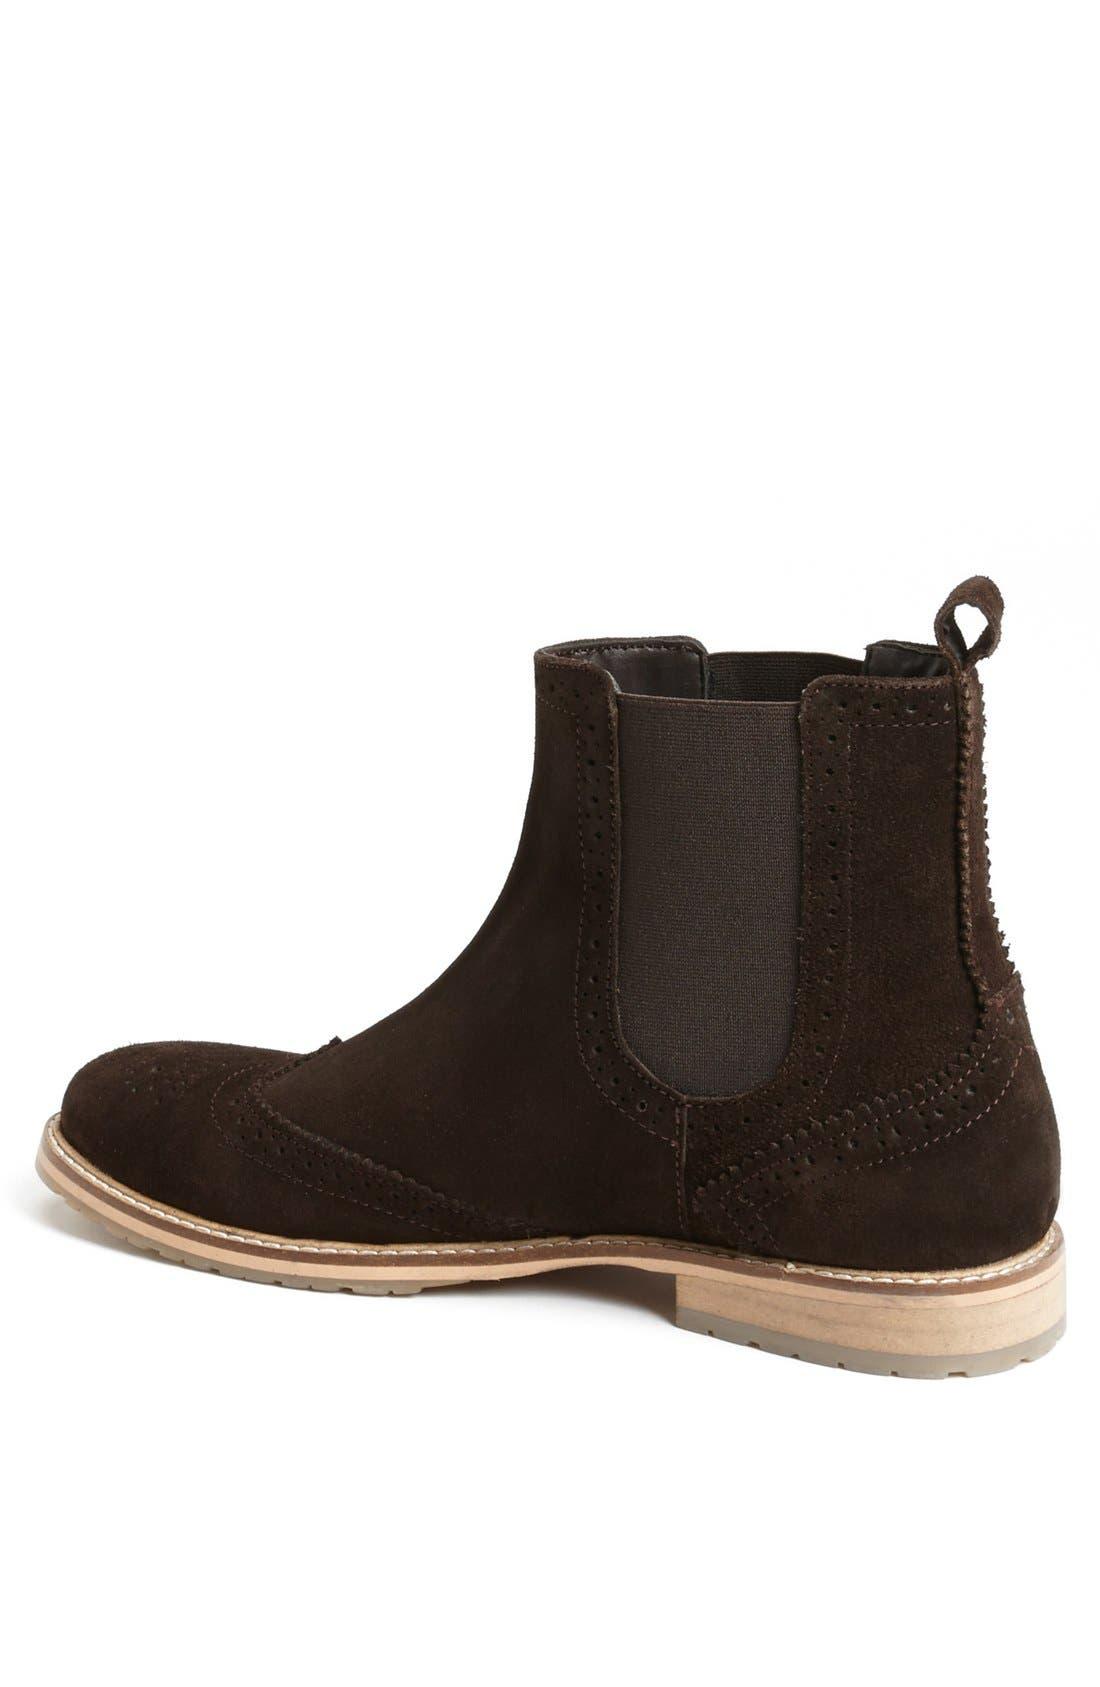 Alternate Image 2  - Ben Sherman 'Bruno' Wingtip Chelsea Boot (Men)